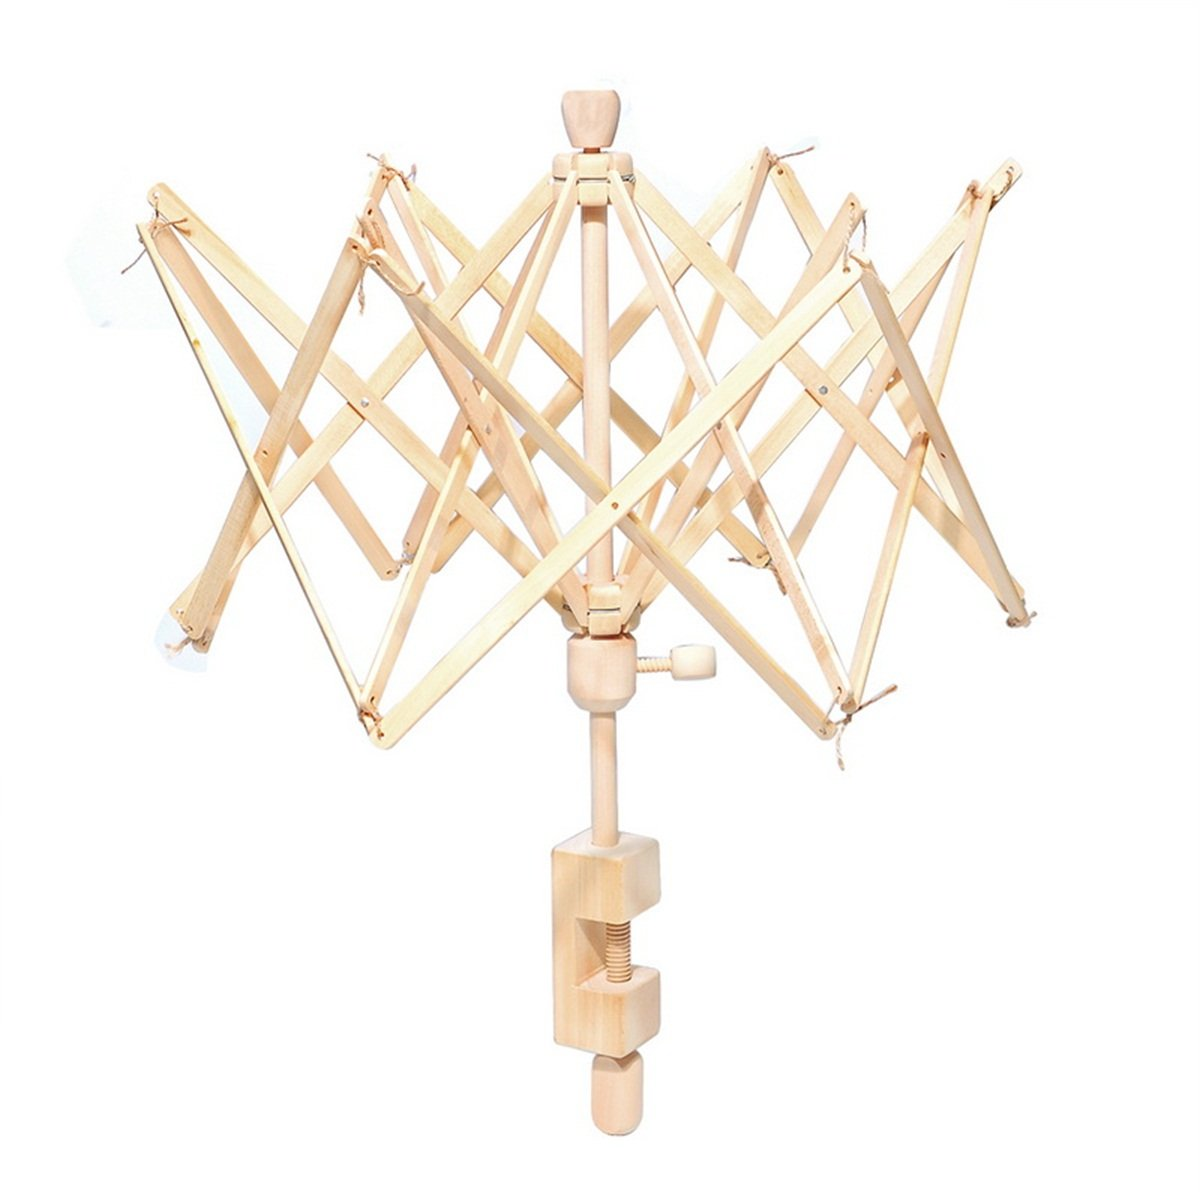 Valyria Wooden Umbrella Yarn Swift Bobbin Winder Winding Lines, Fiber, Yarns or Other Strings Winder Holder